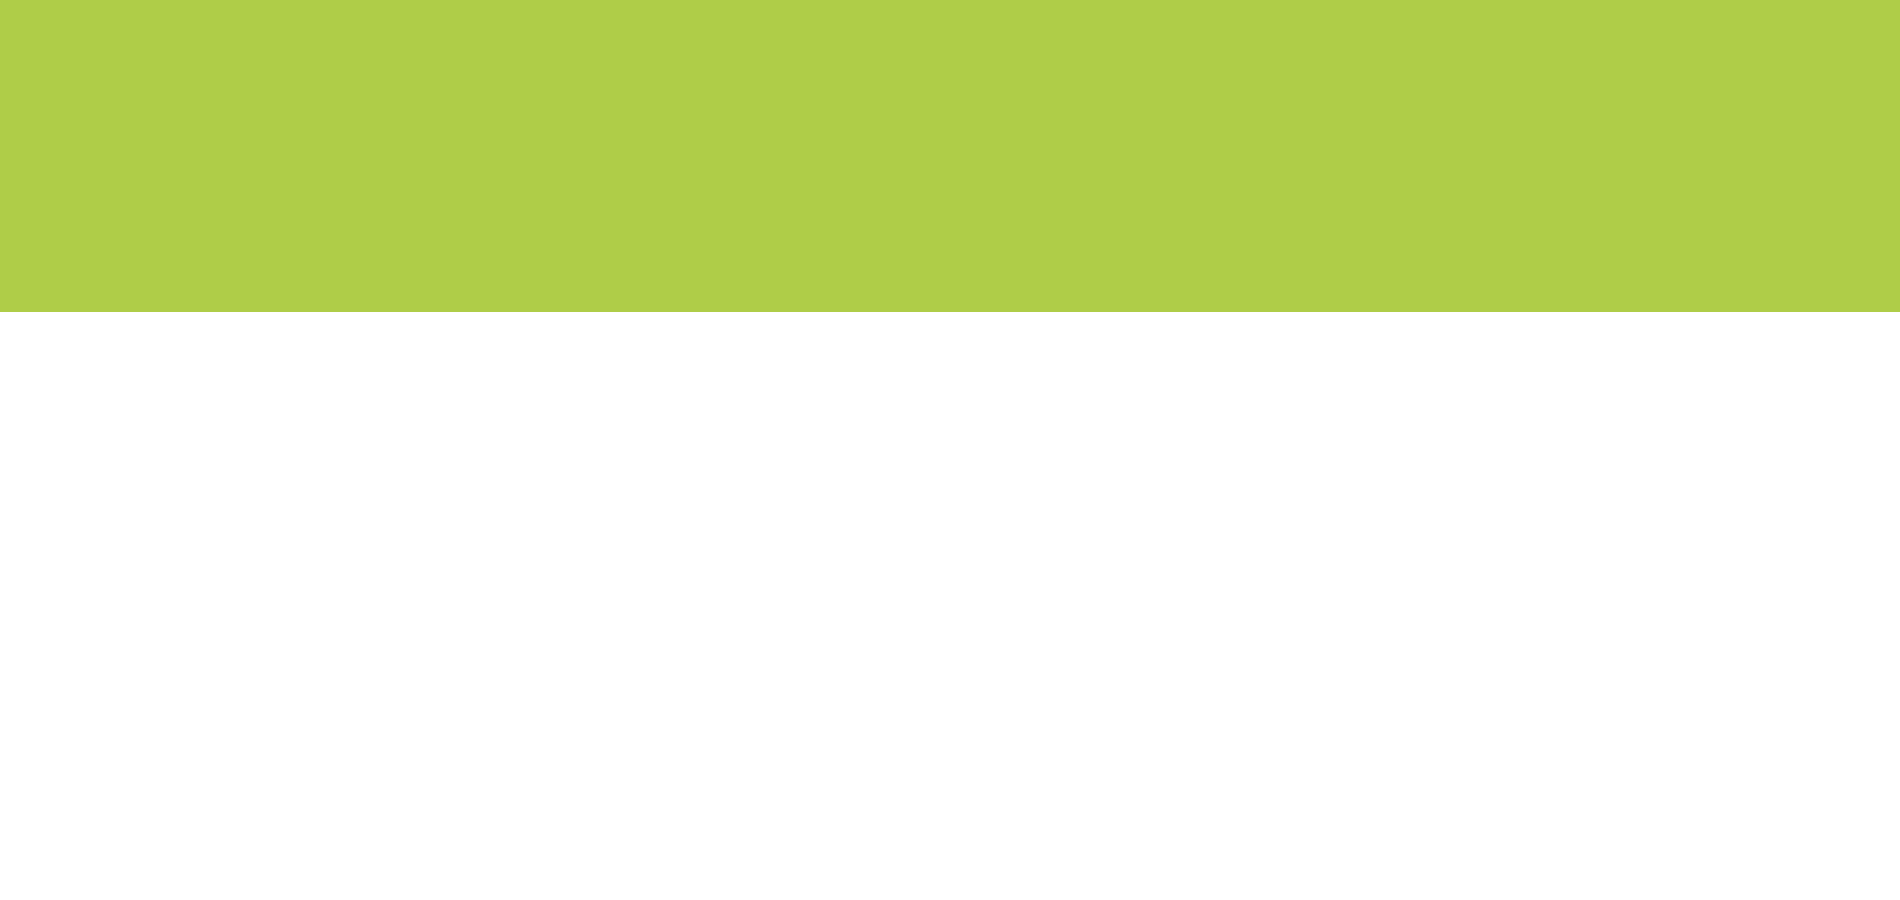 blocco verde trasparente